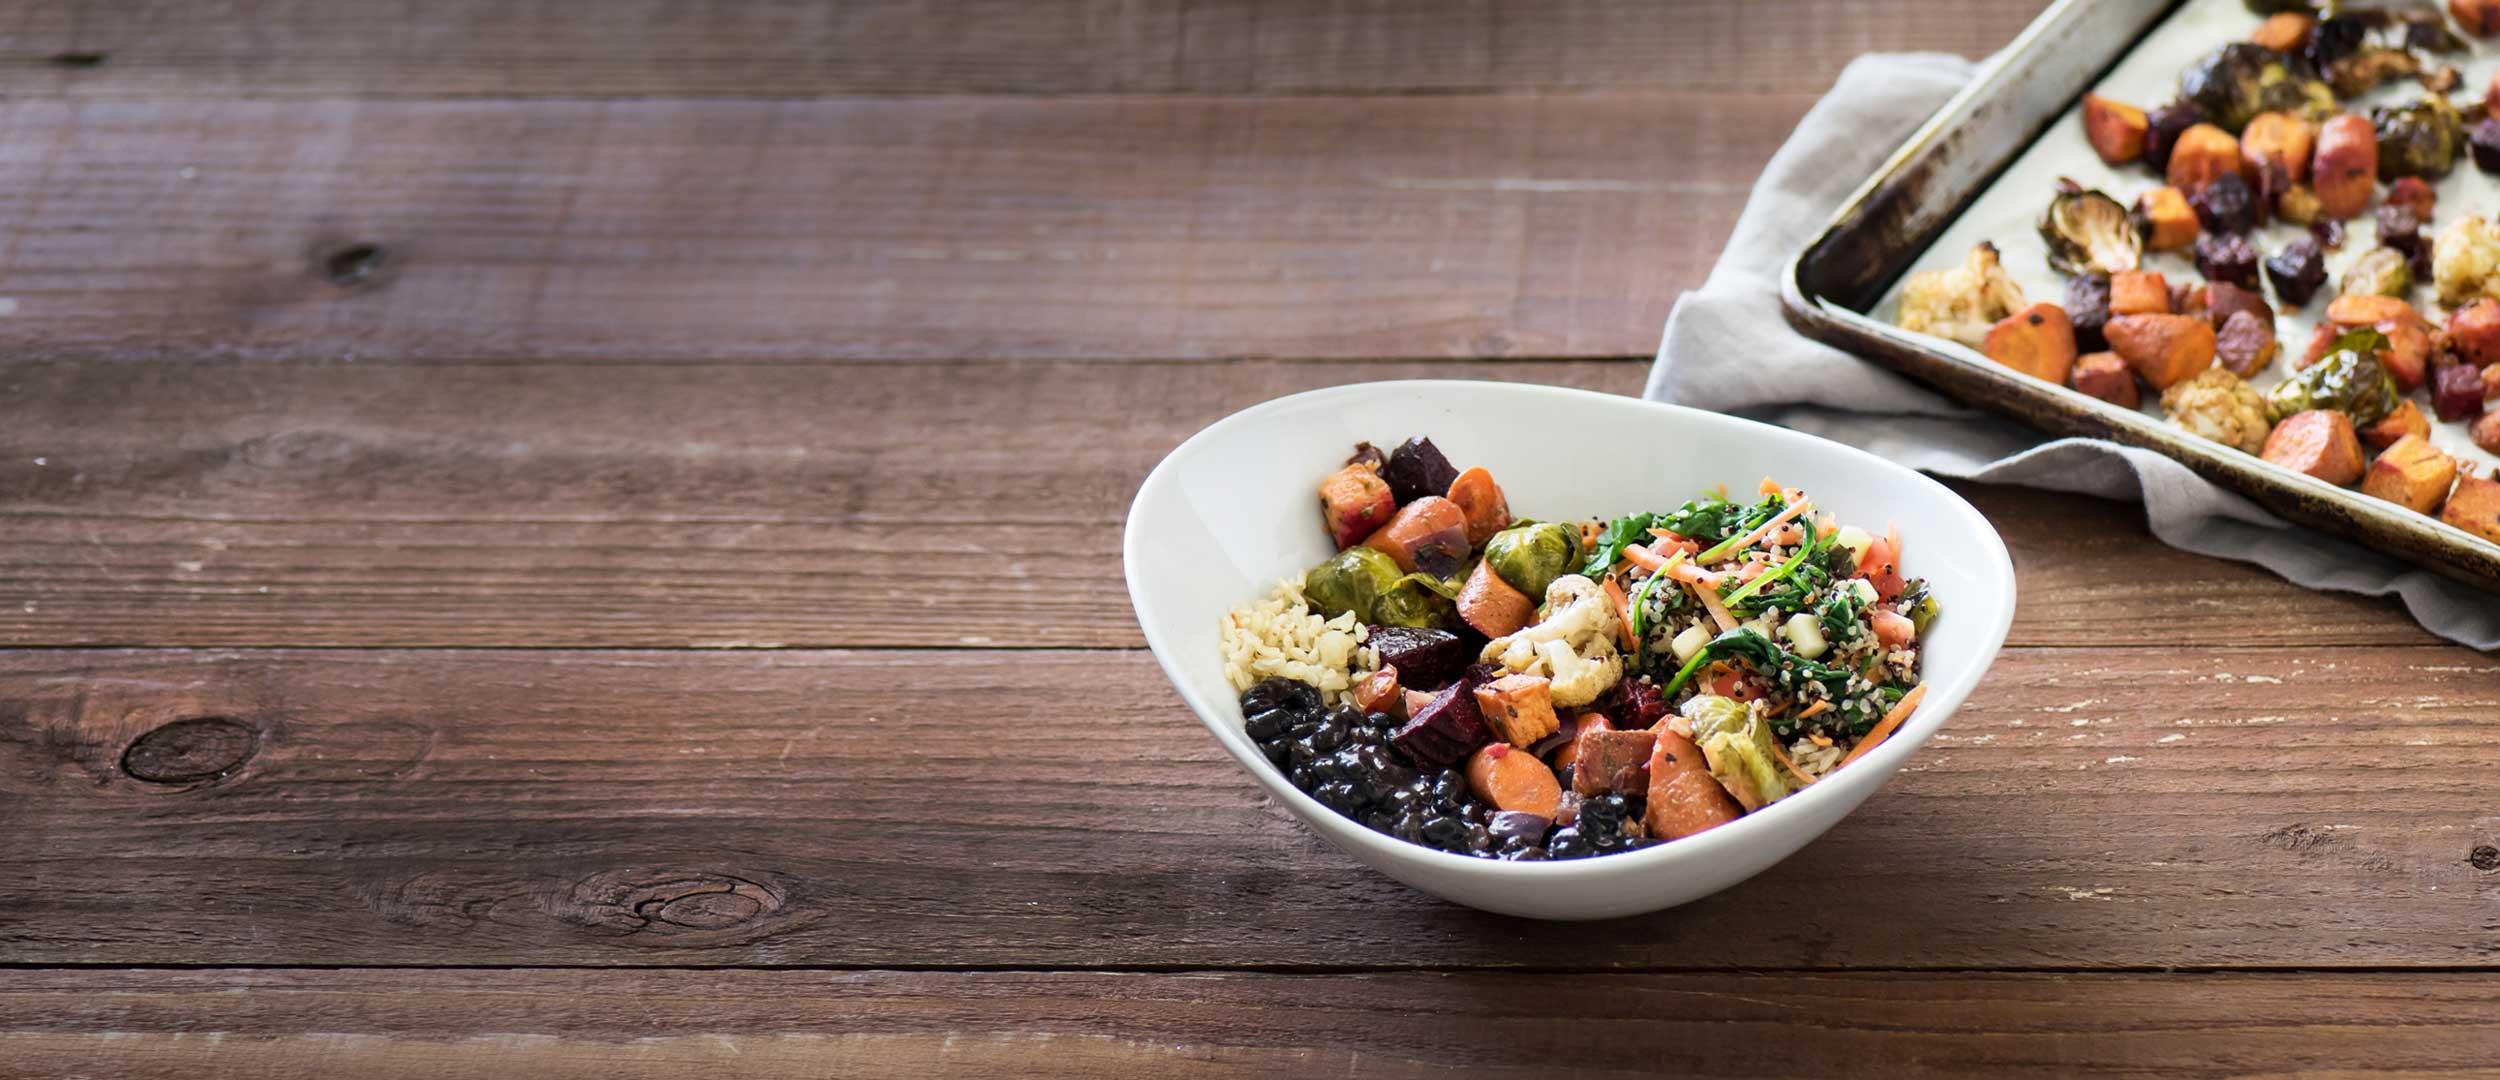 Organic Roasted Vegetable Bowl